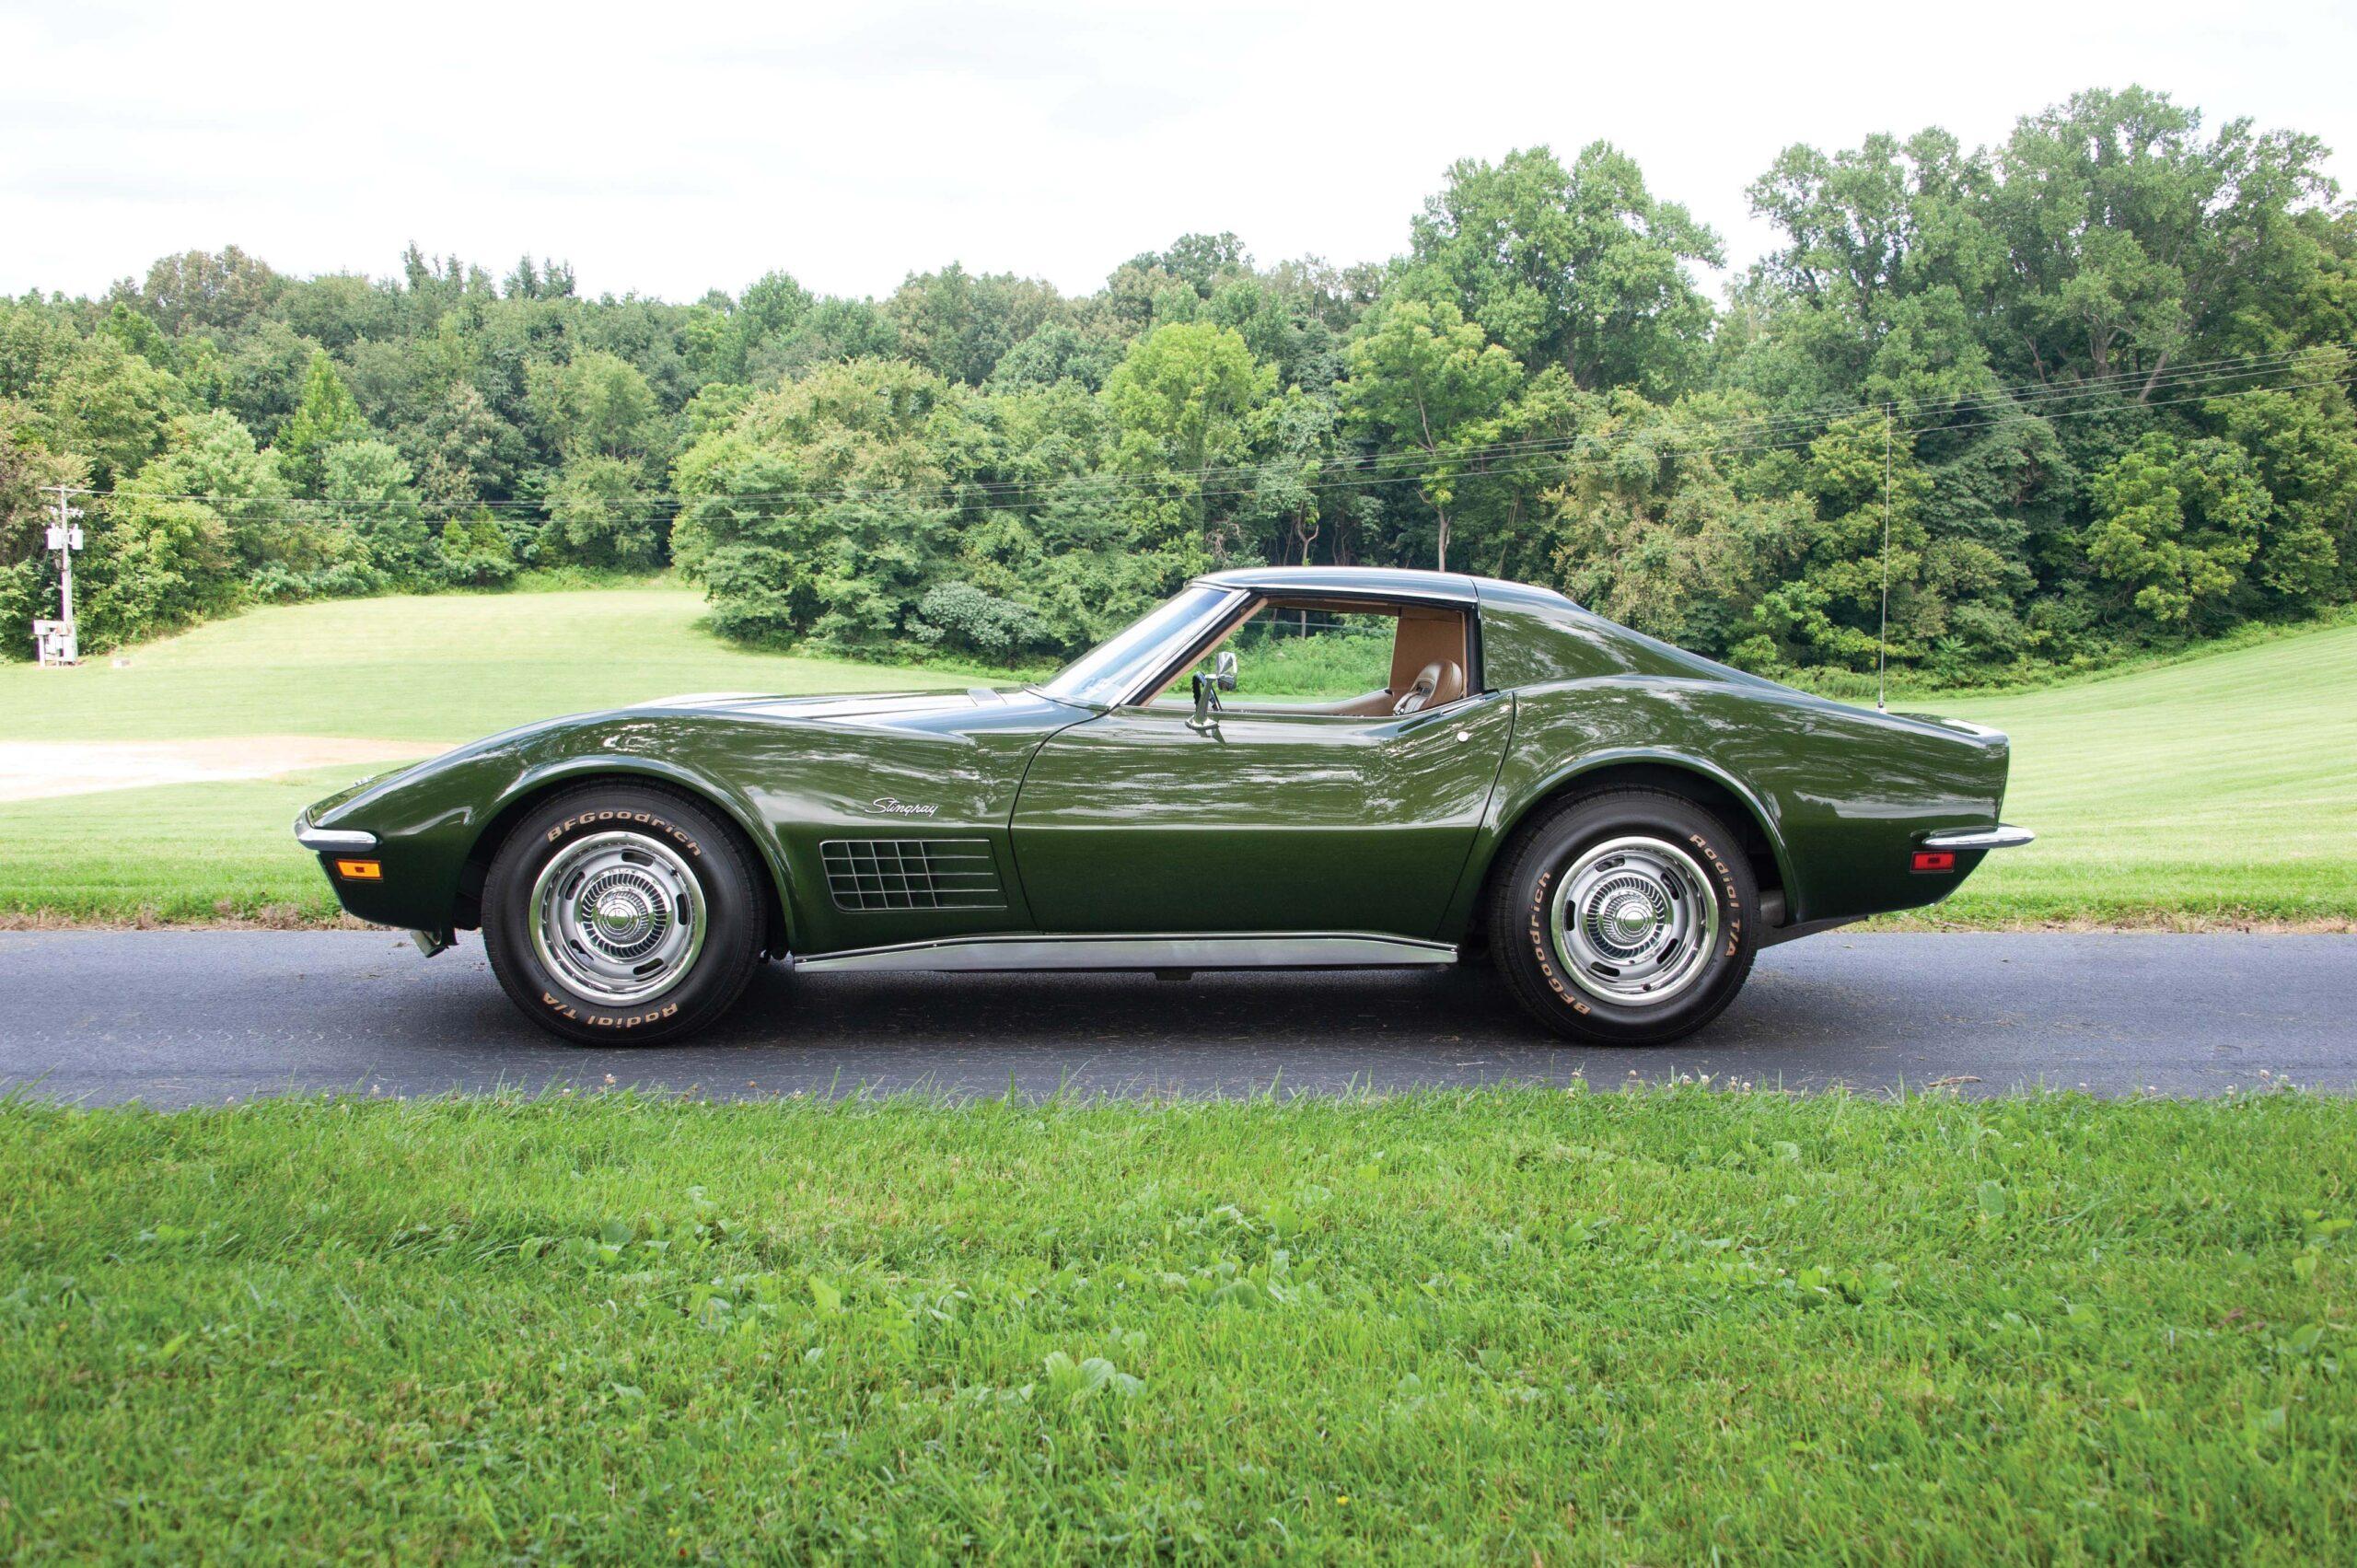 A Work of Heart: Couple Donates 1970 Corvette